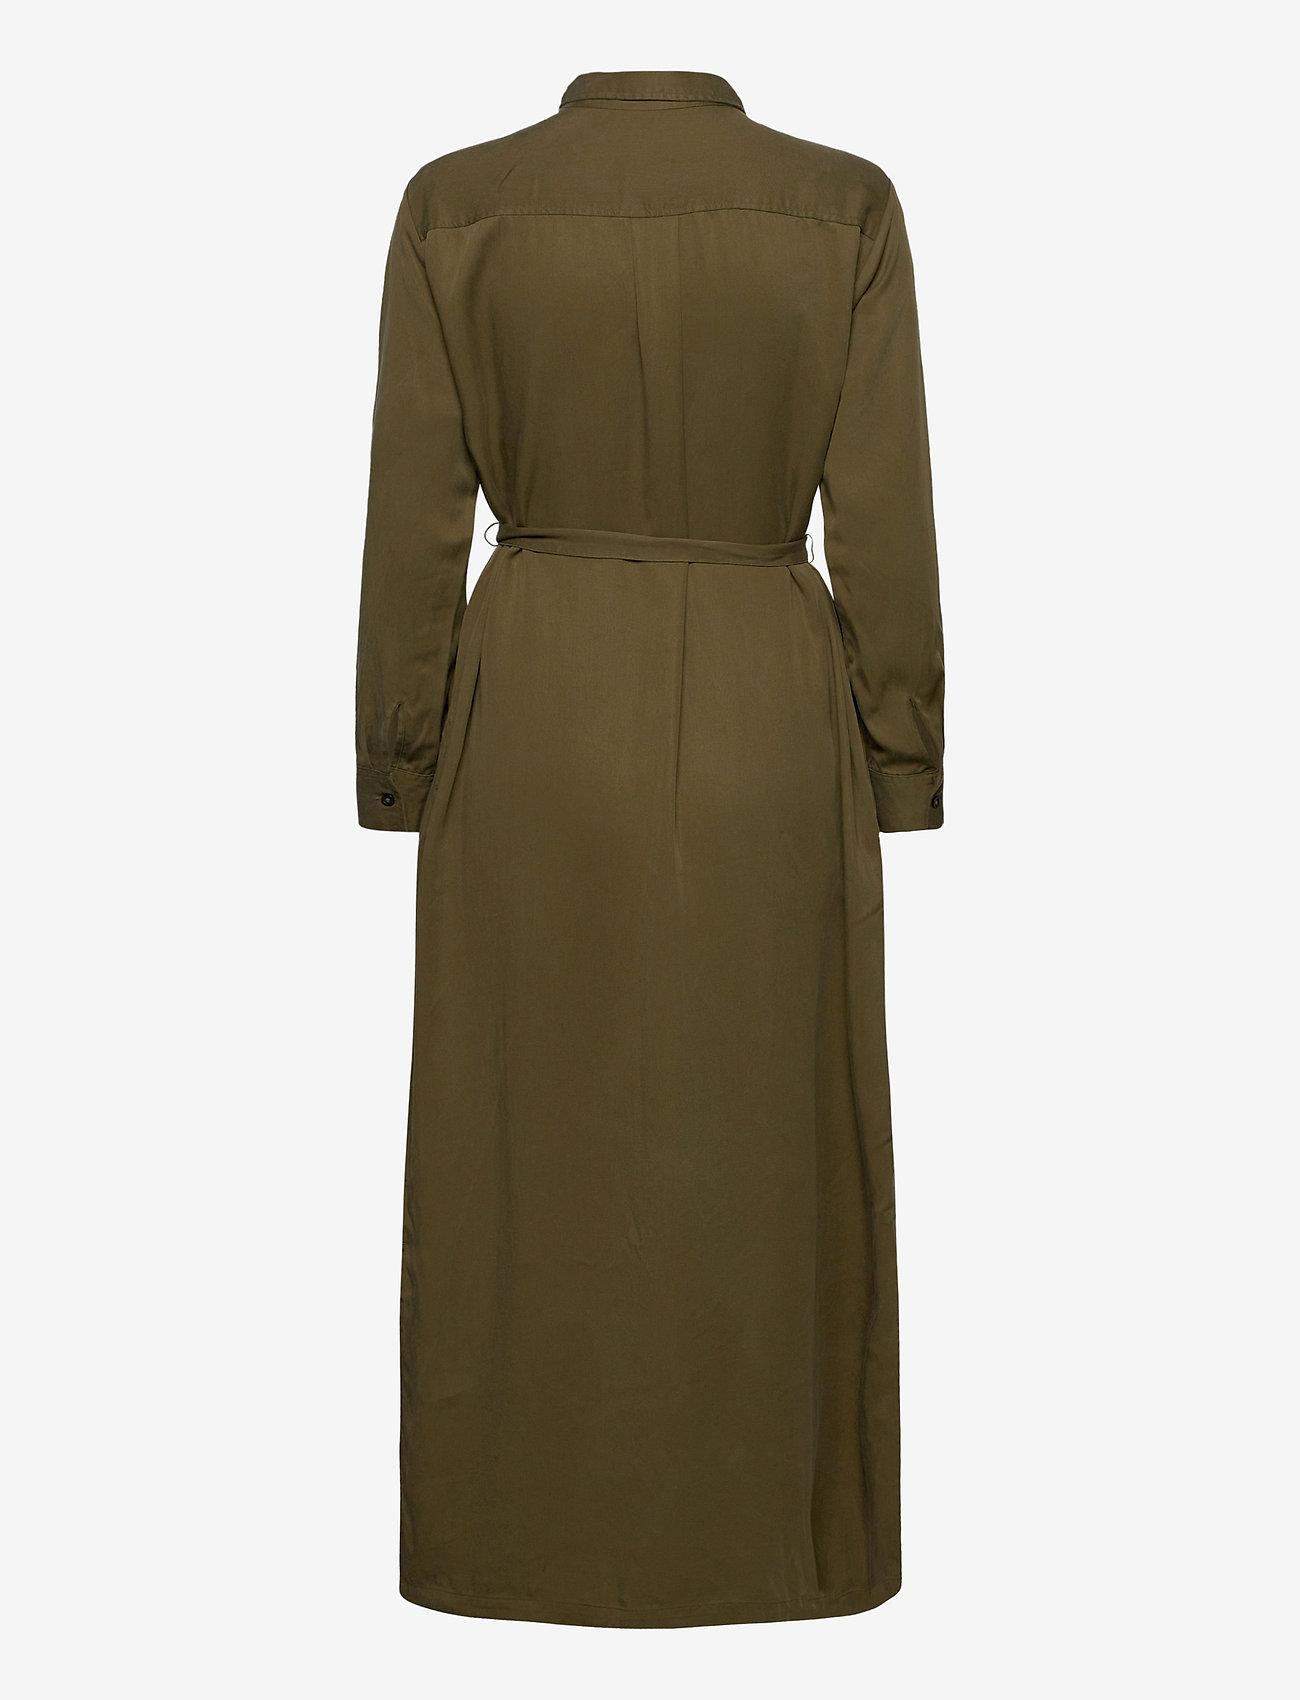 GAP - LS DRAPEY SHRTDRS - midi dresses - ripe olive - 1